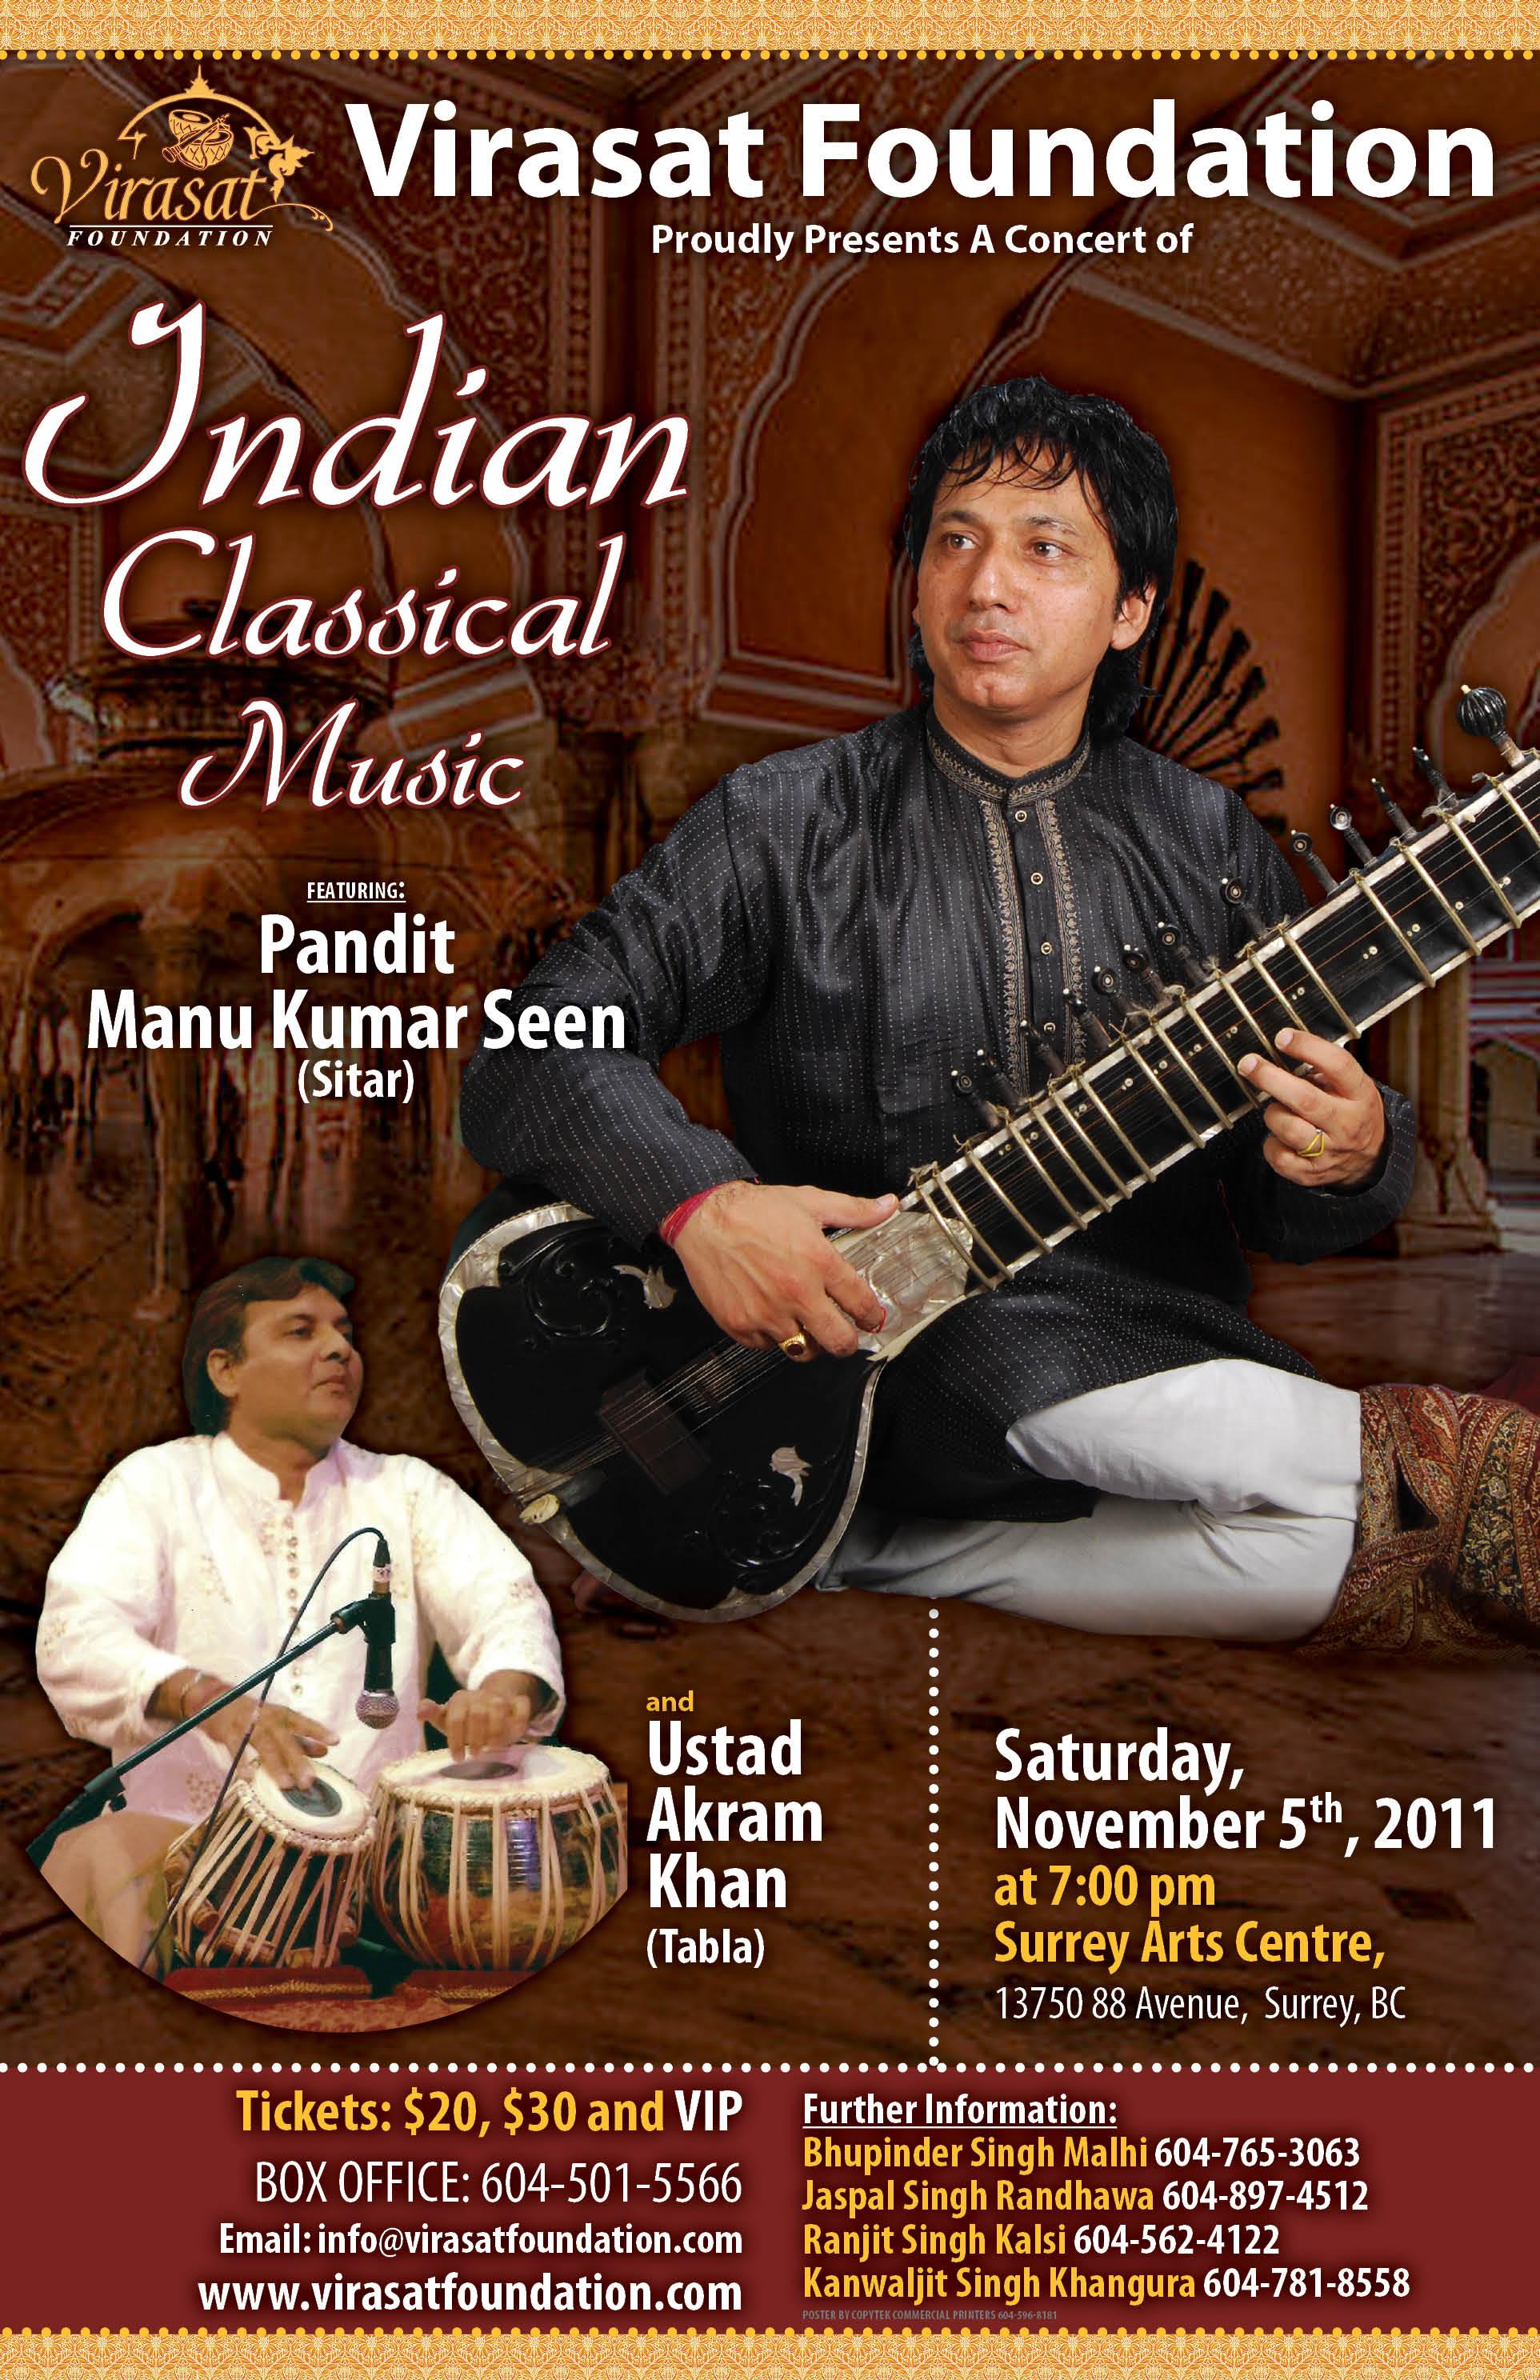 Indian Classical Music At Surrey Arts Centre Nov 5 11 Uddari